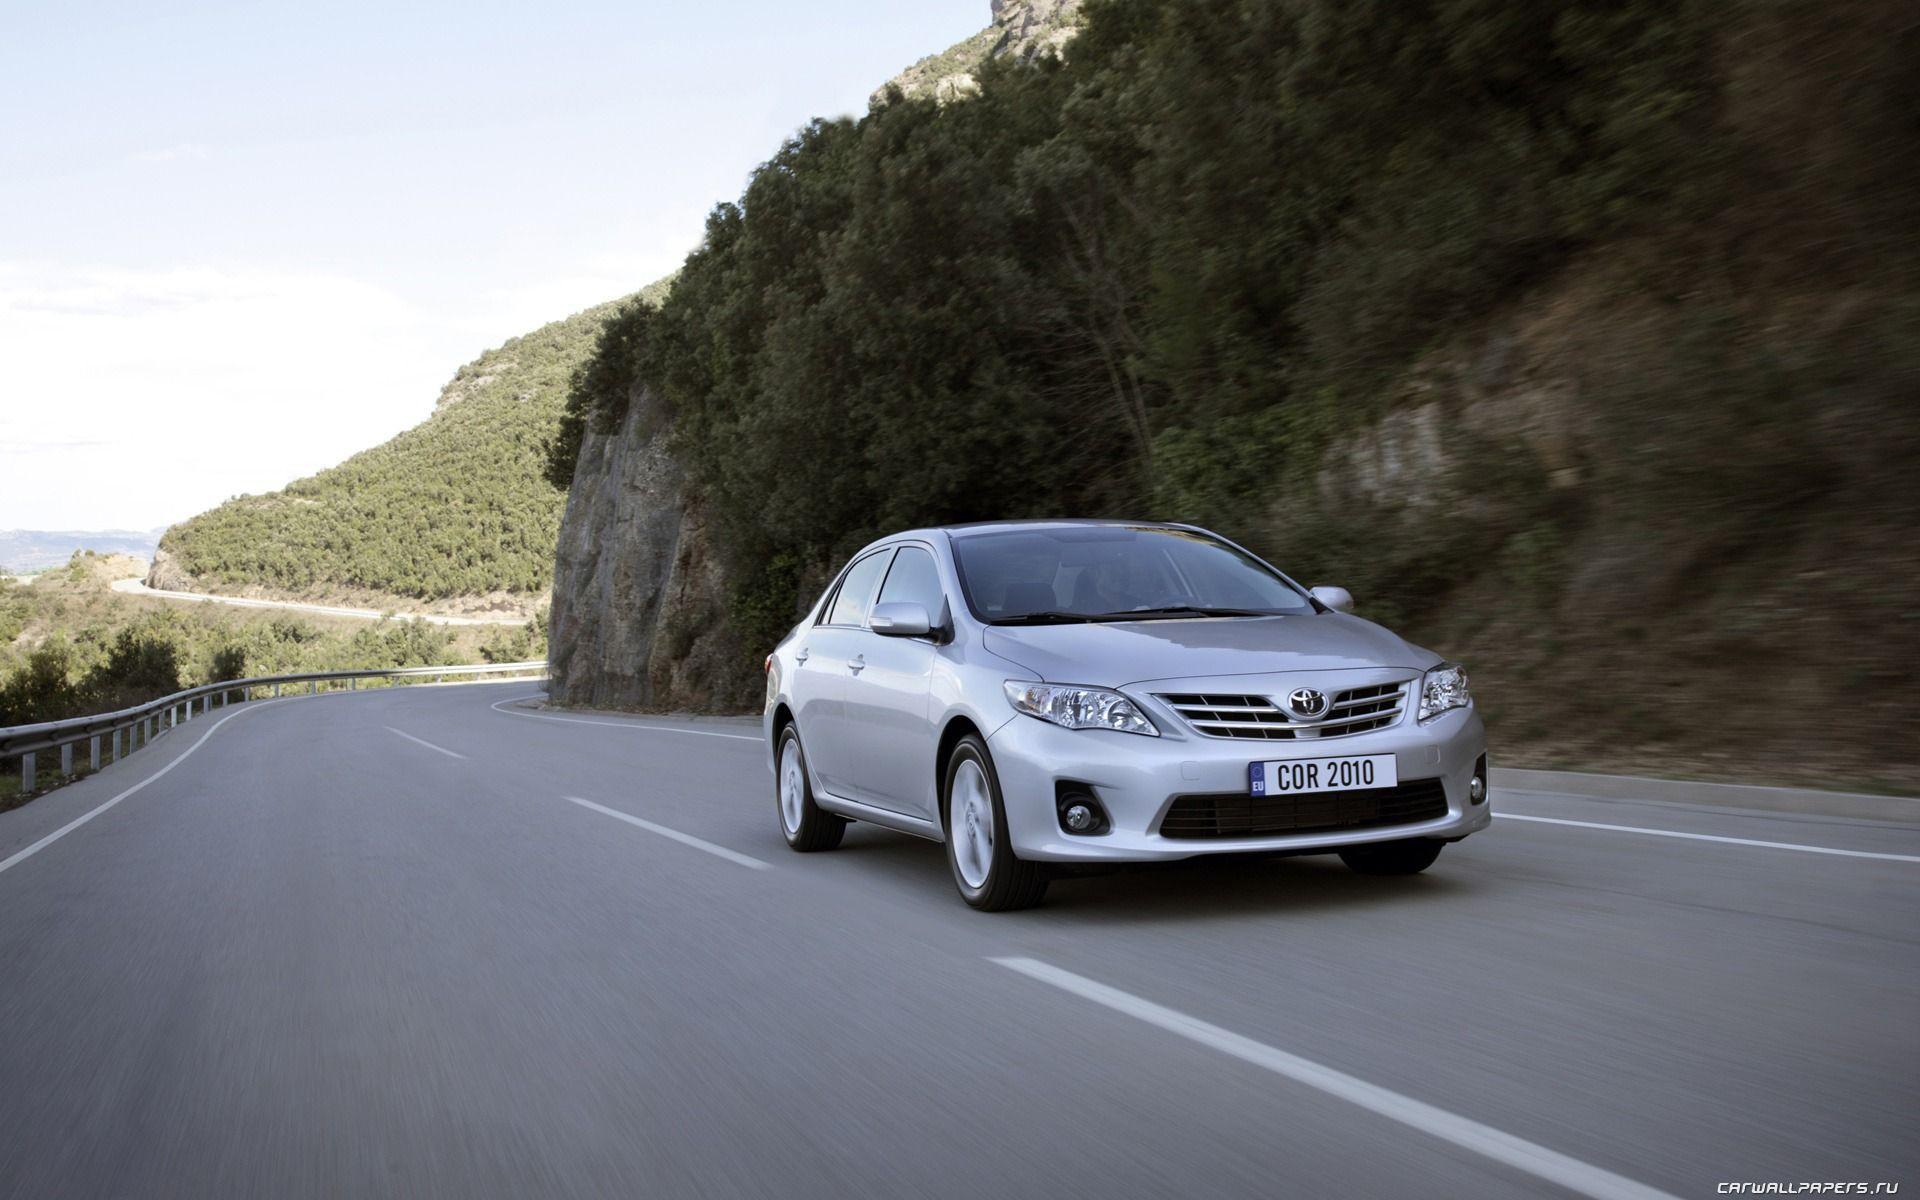 Toyota Corolla - 2010 HD wallpaper #5 - 1920x1200 Wallpaper ...